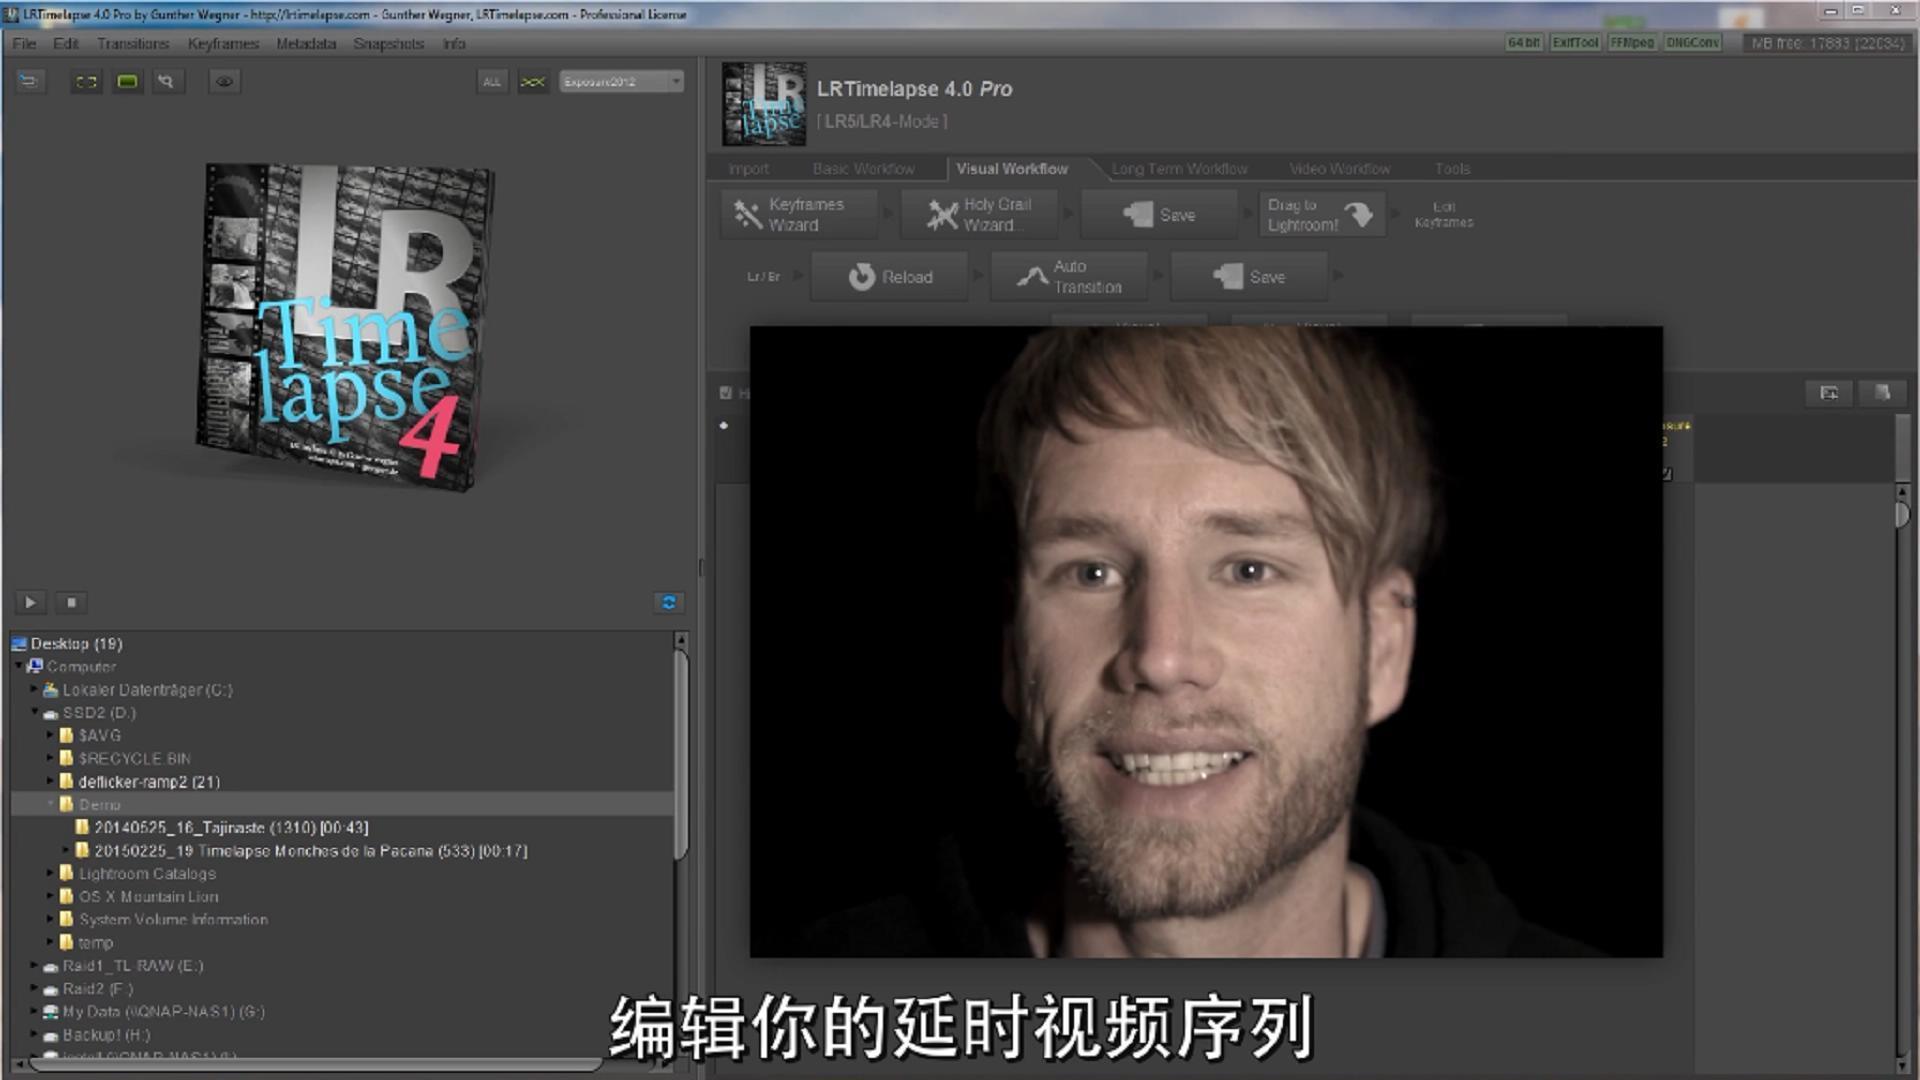 【S190】LRTimelapse – 延时摄影入门到精通全套教程【中文字幕】